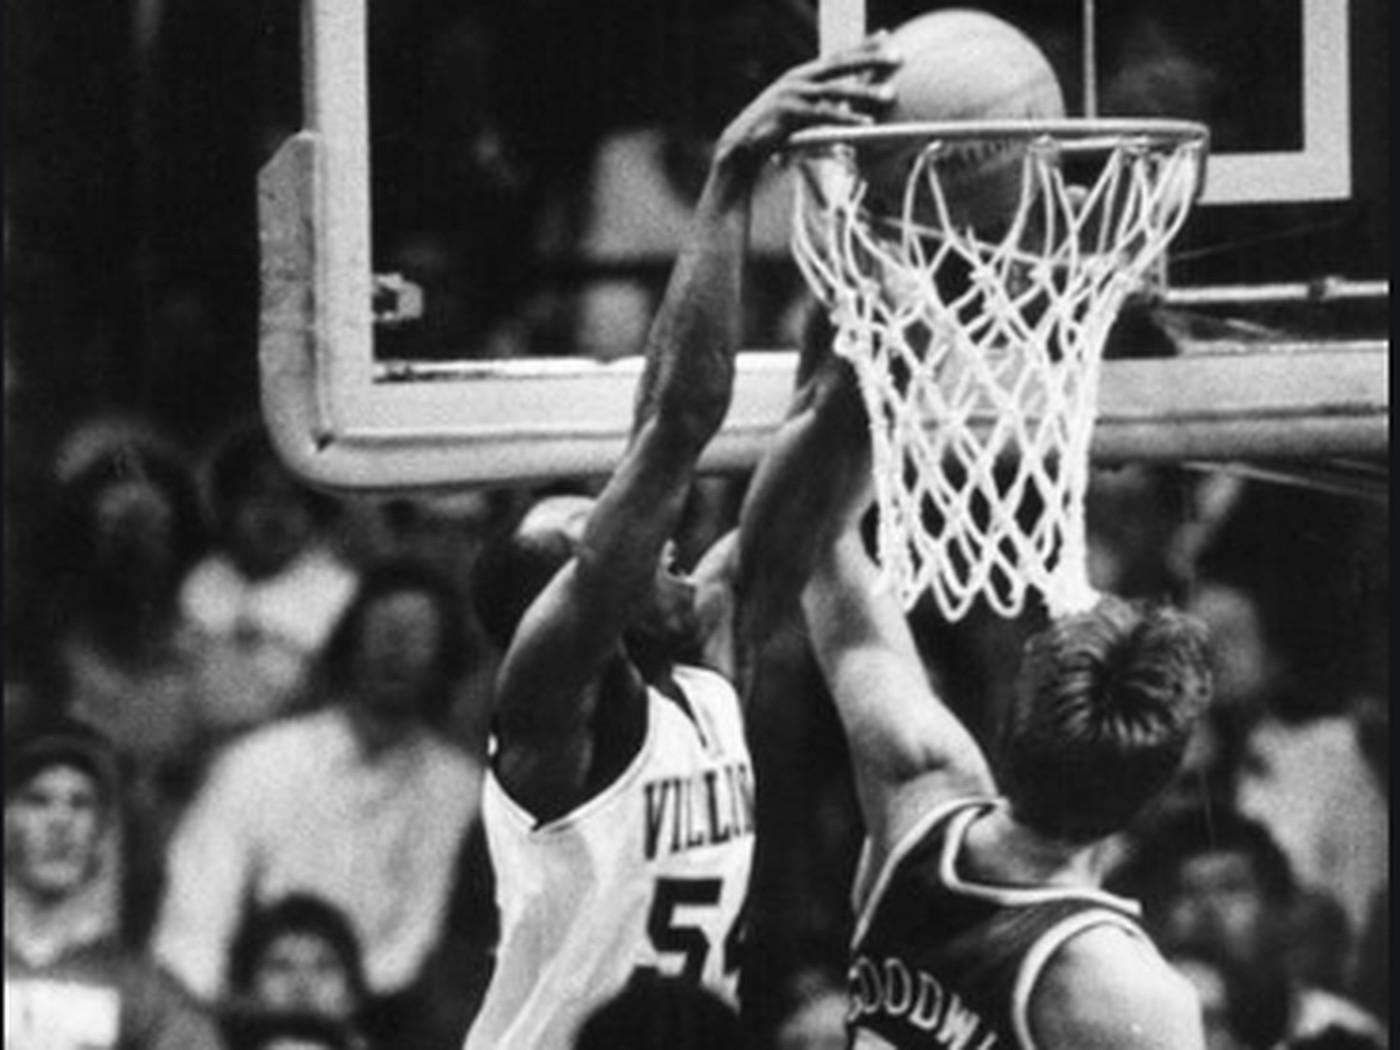 Tournament Throwback 8 Villanova Vs 9 Dayton 1985 Vu Hoops